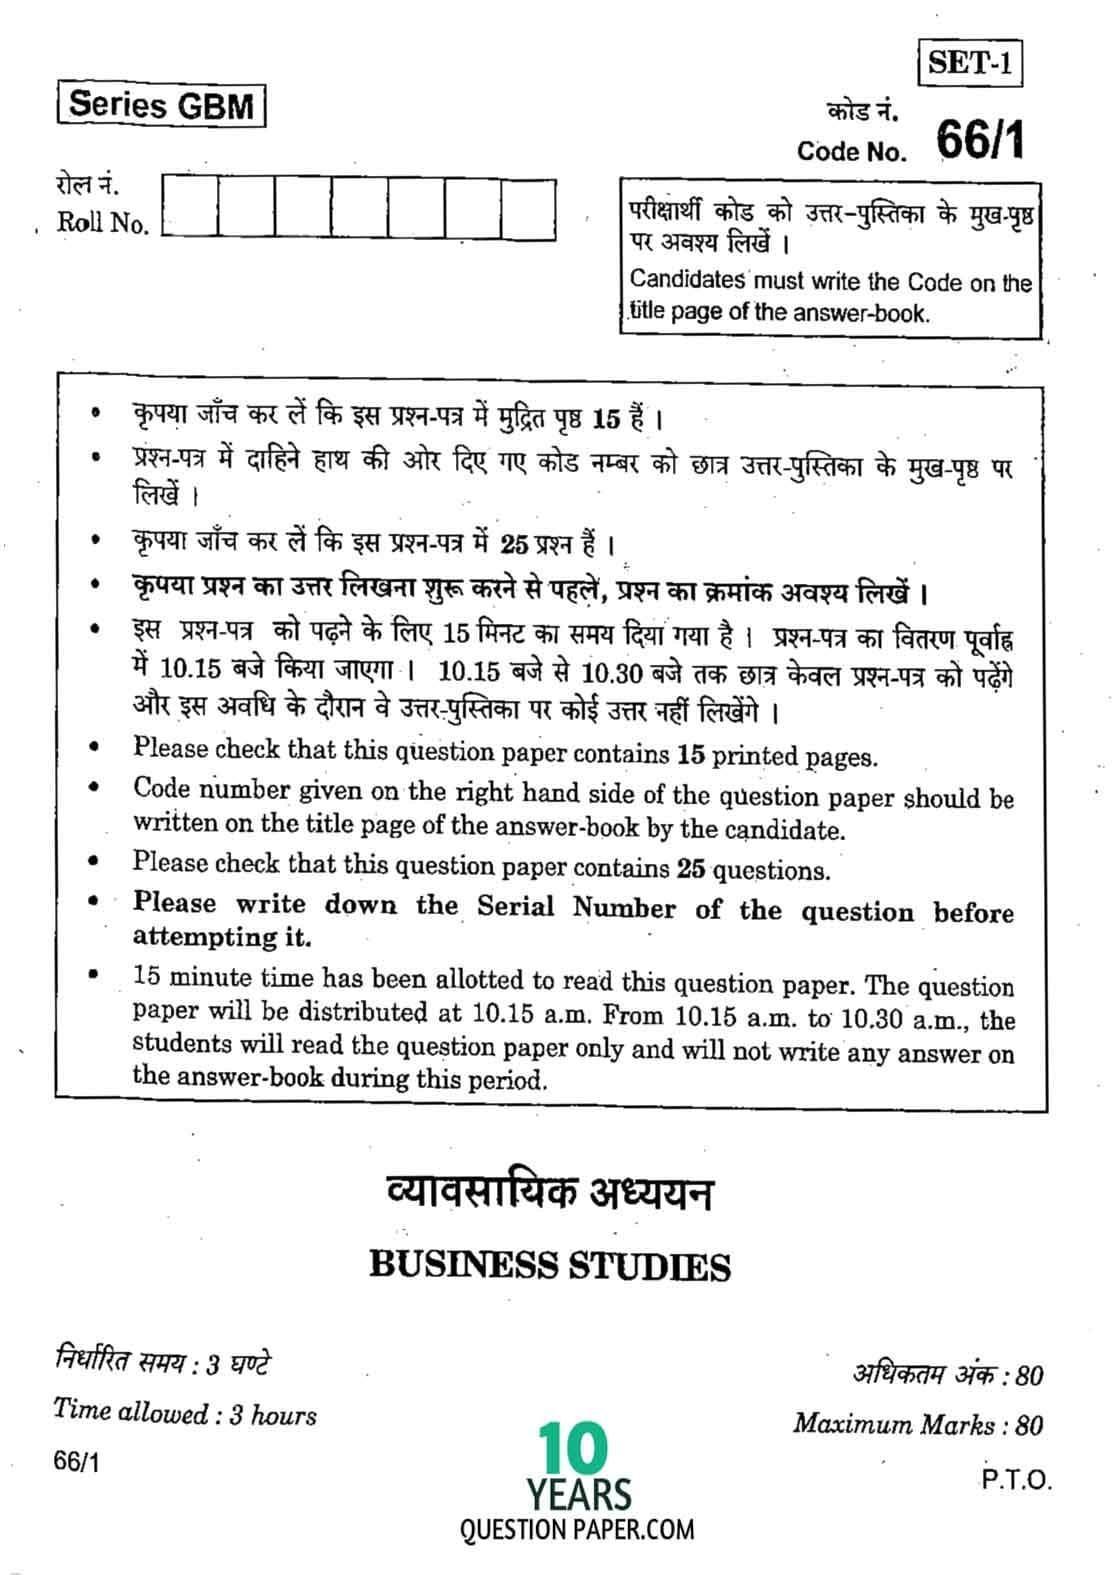 CBSE Class 12 Business Studies 2017 Question Paper